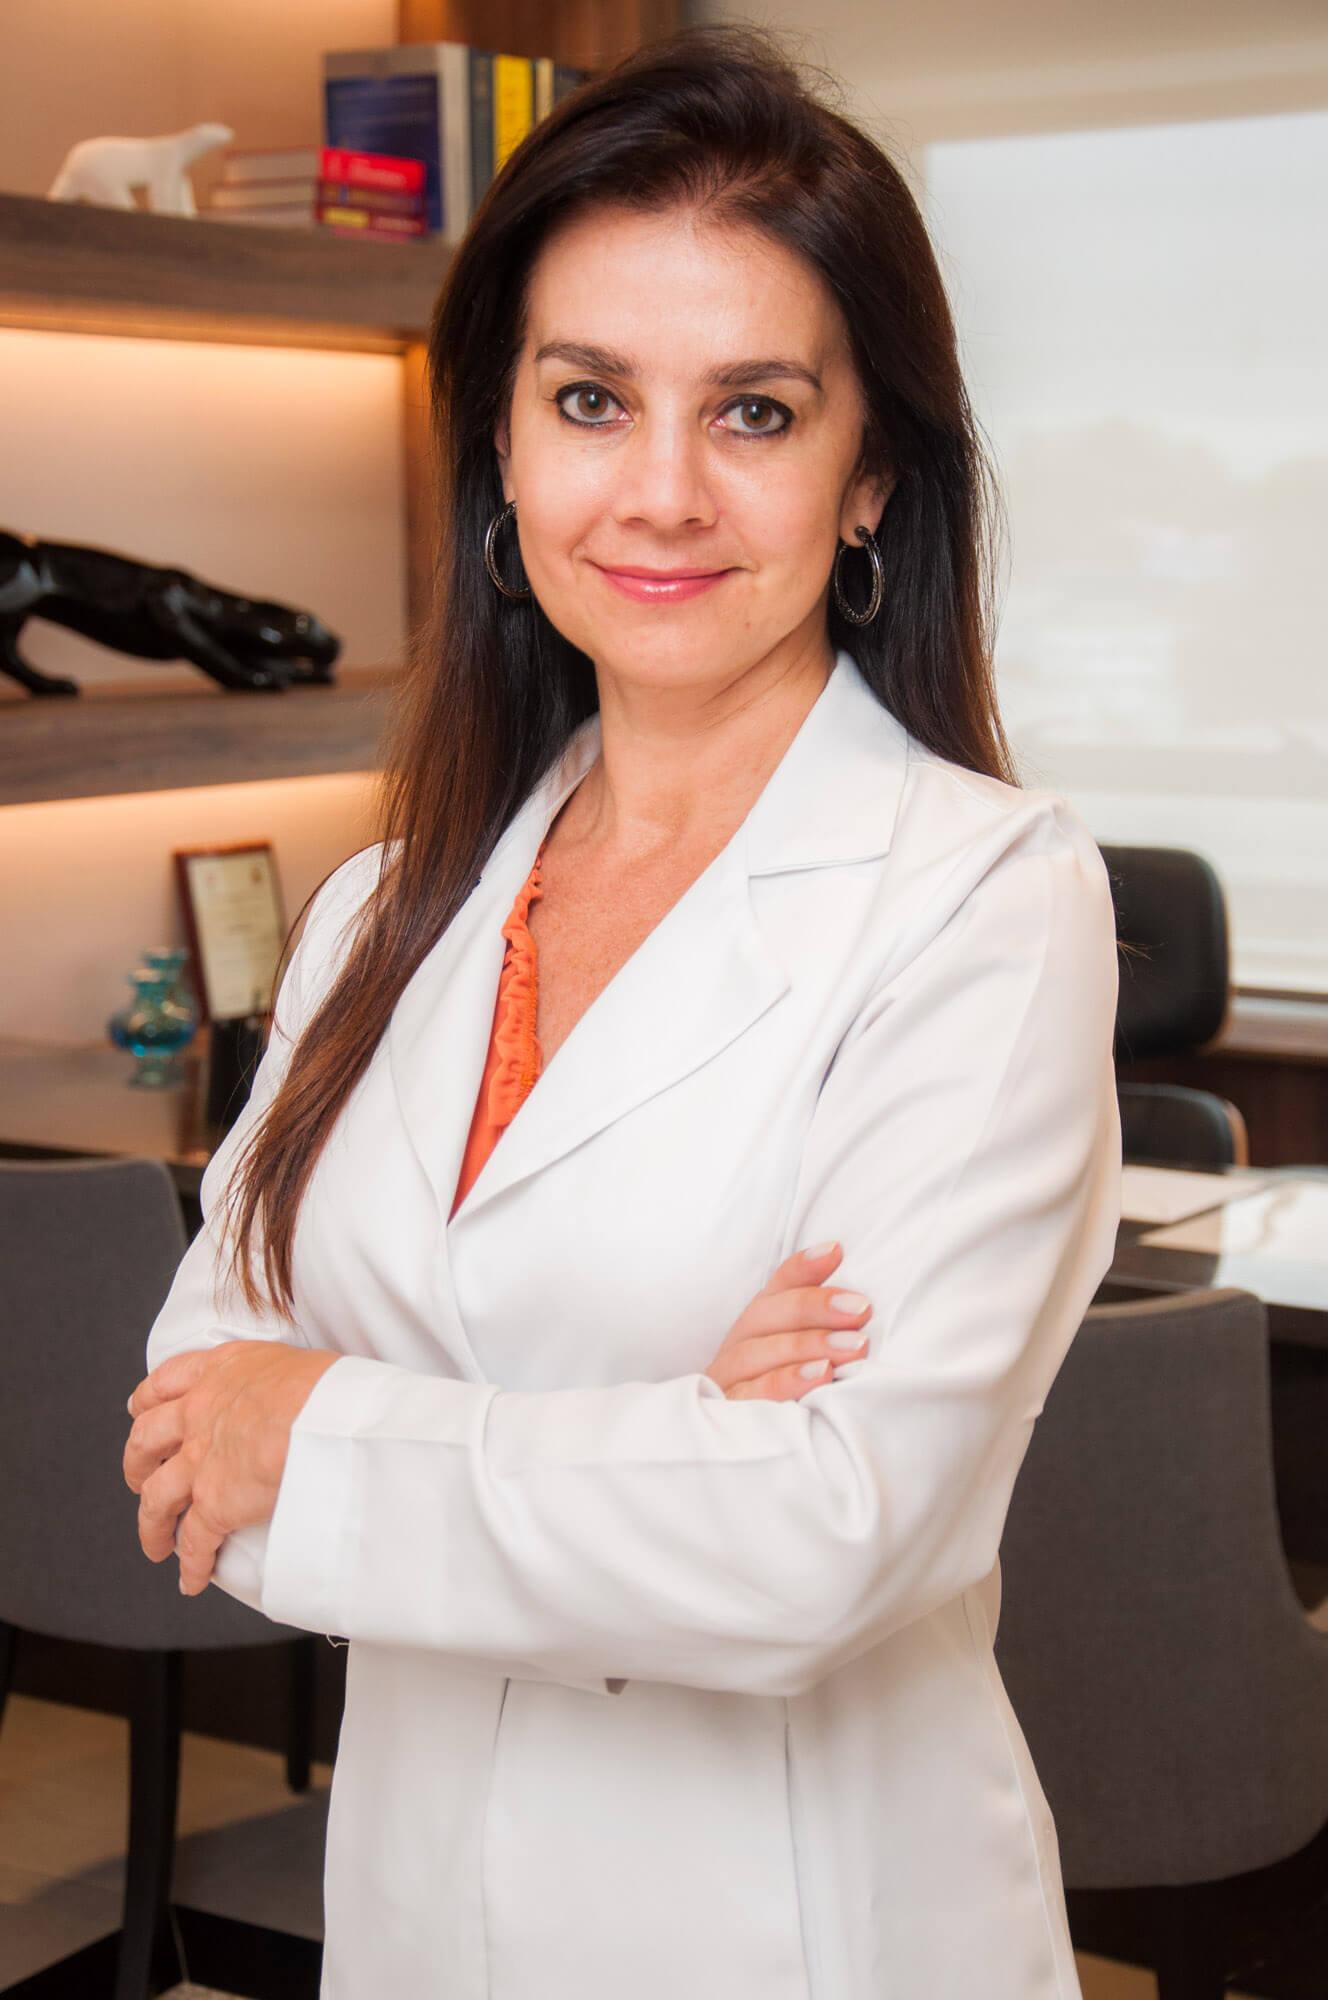 FDS_Clinica-DR-Alcides-Branco_180308_044